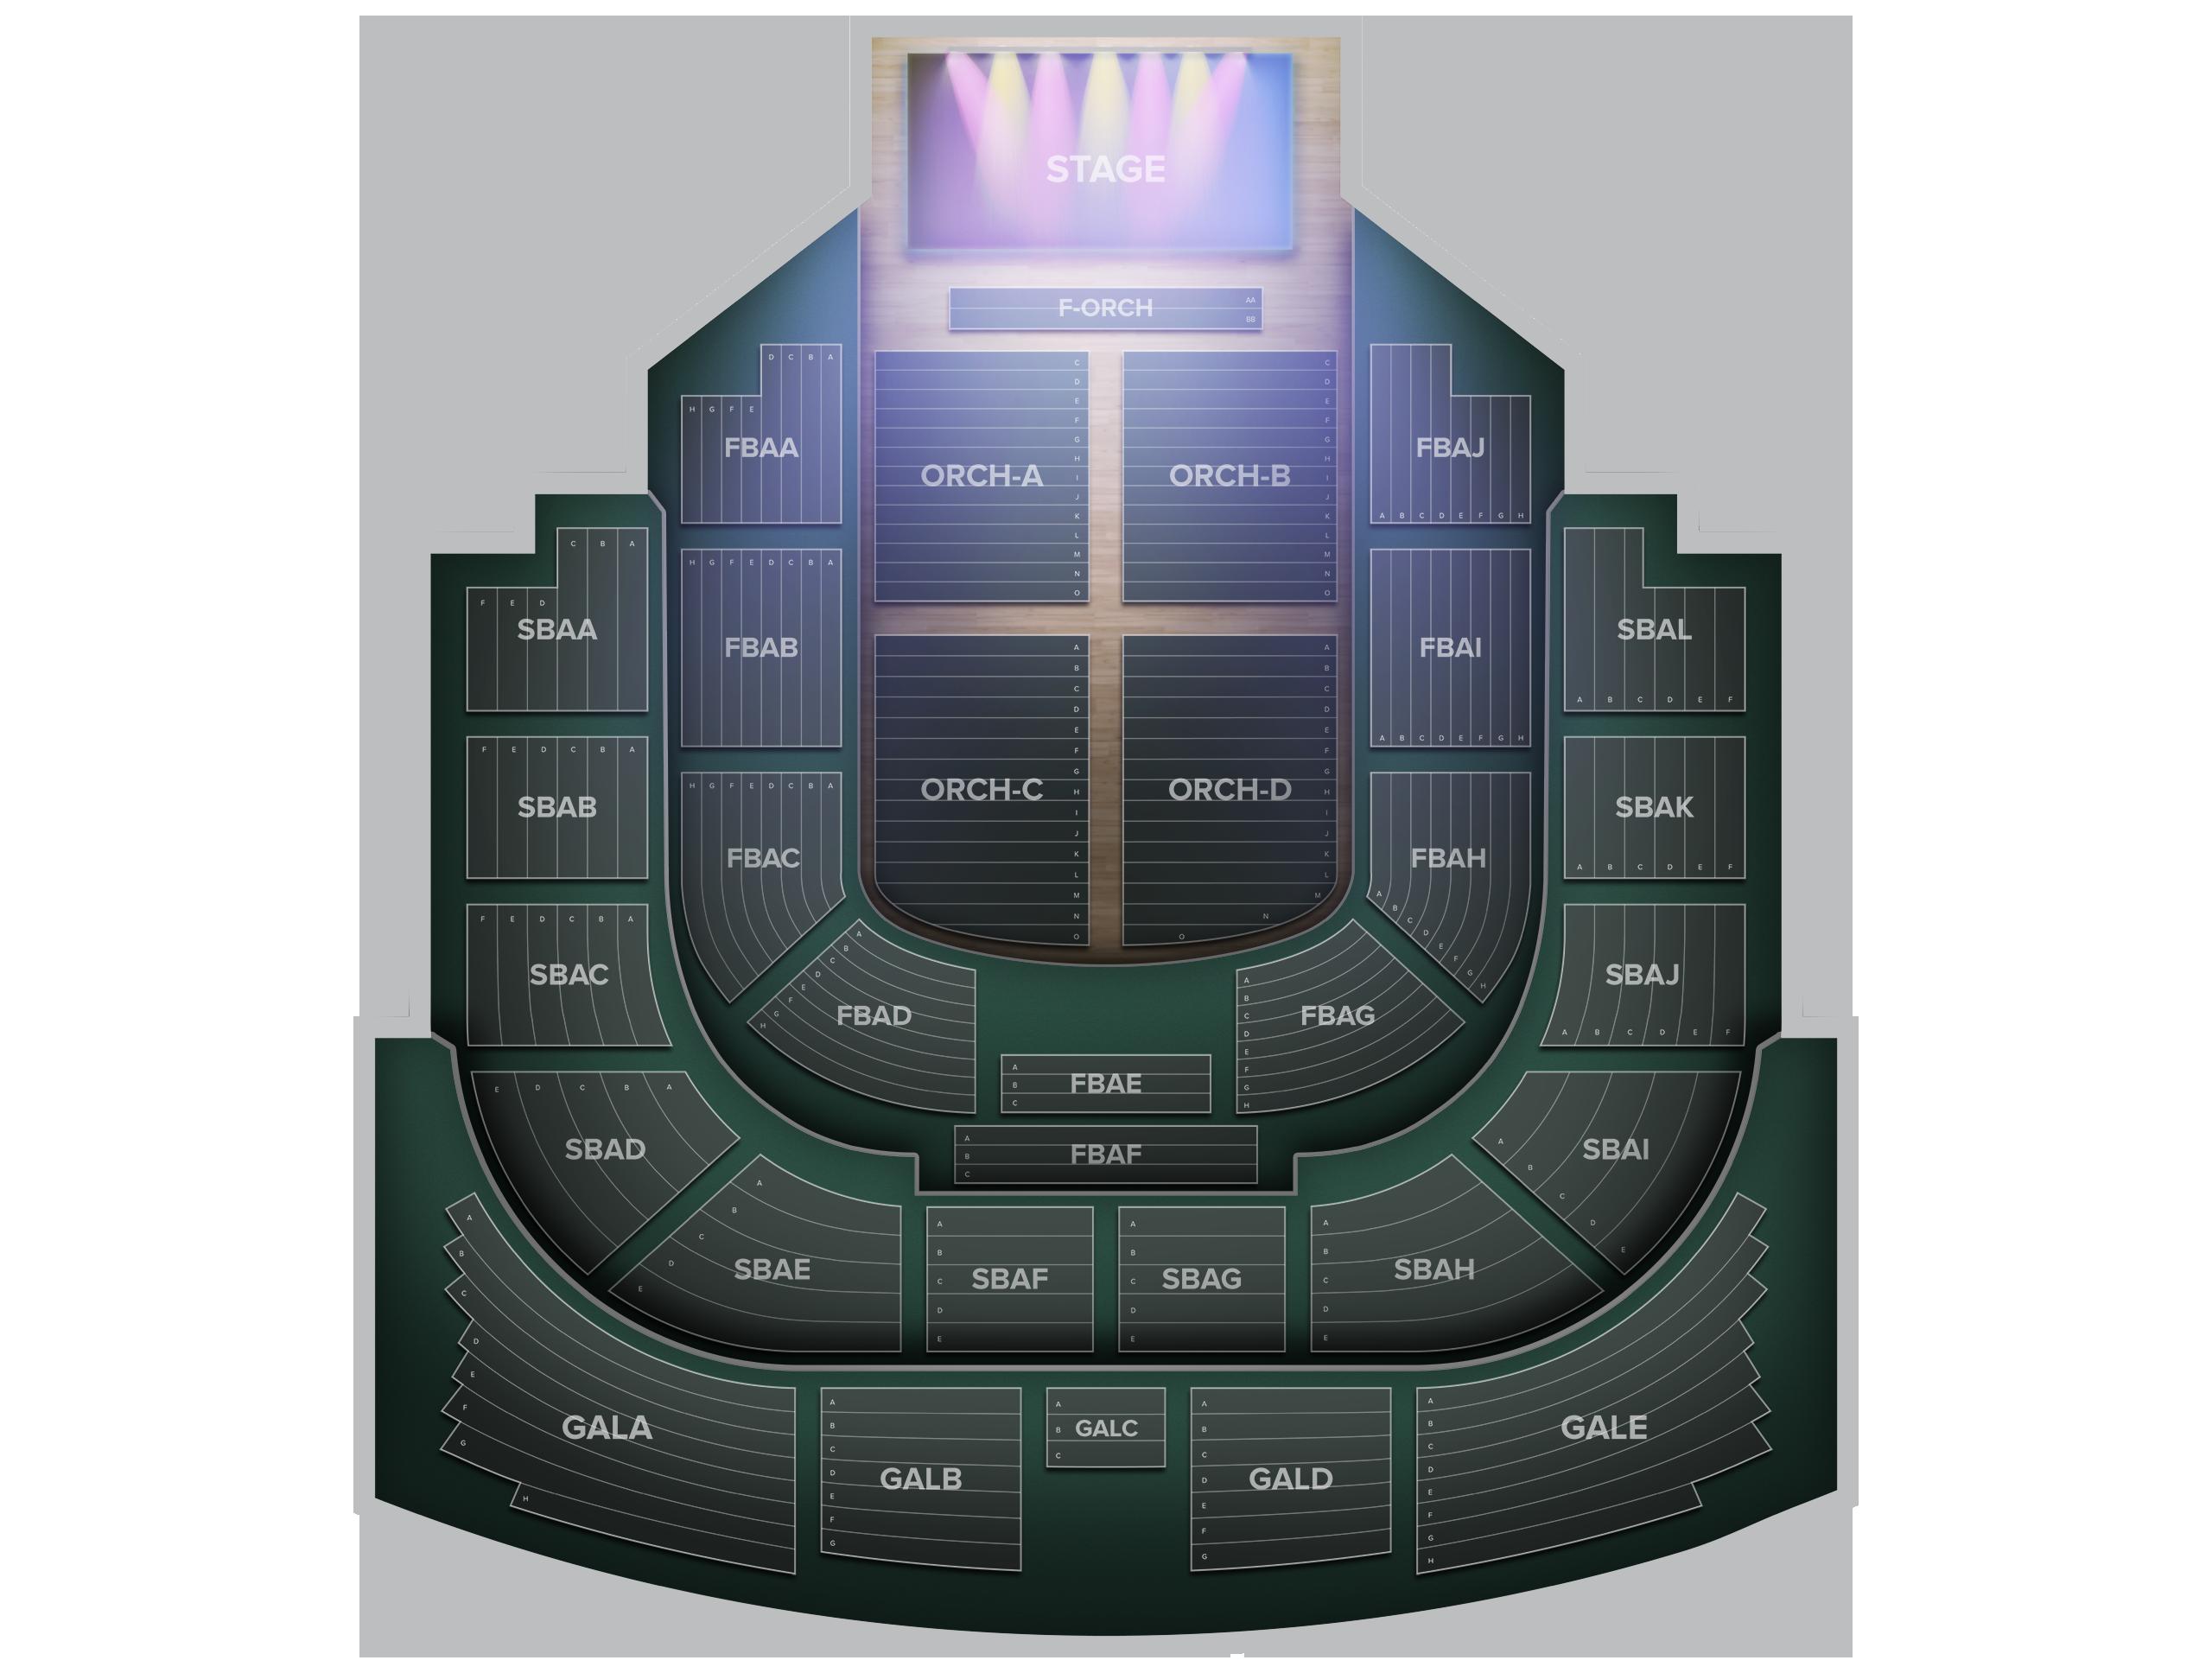 Township Auditorium Tickets